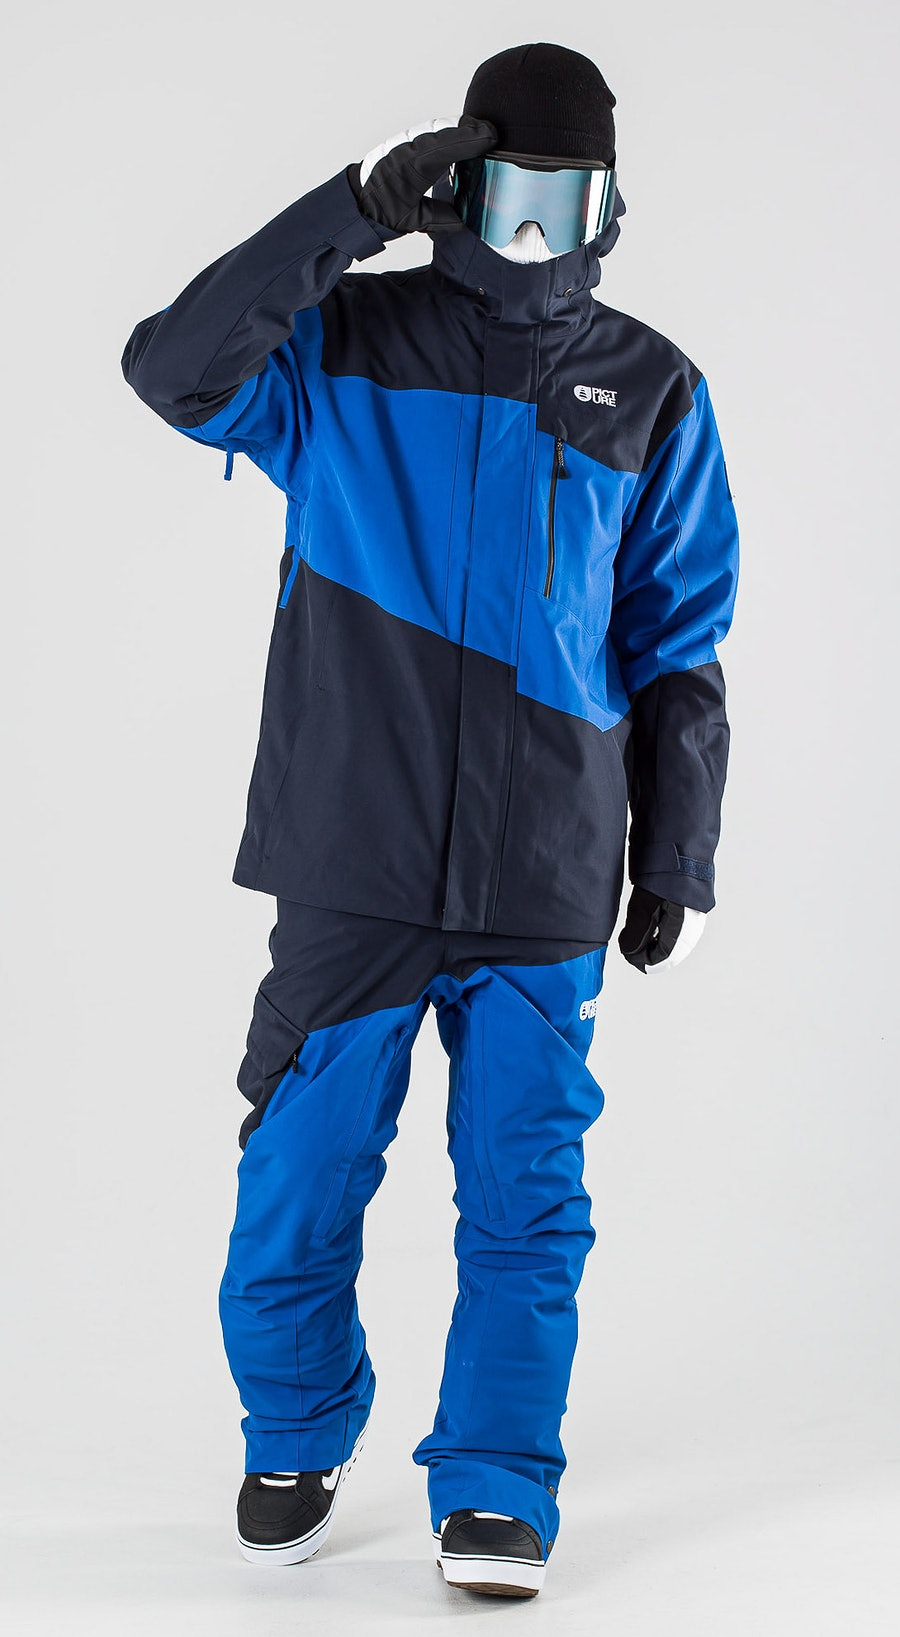 Picture Styler Blue Dark Blue Vêtements de Snowboard  Multi